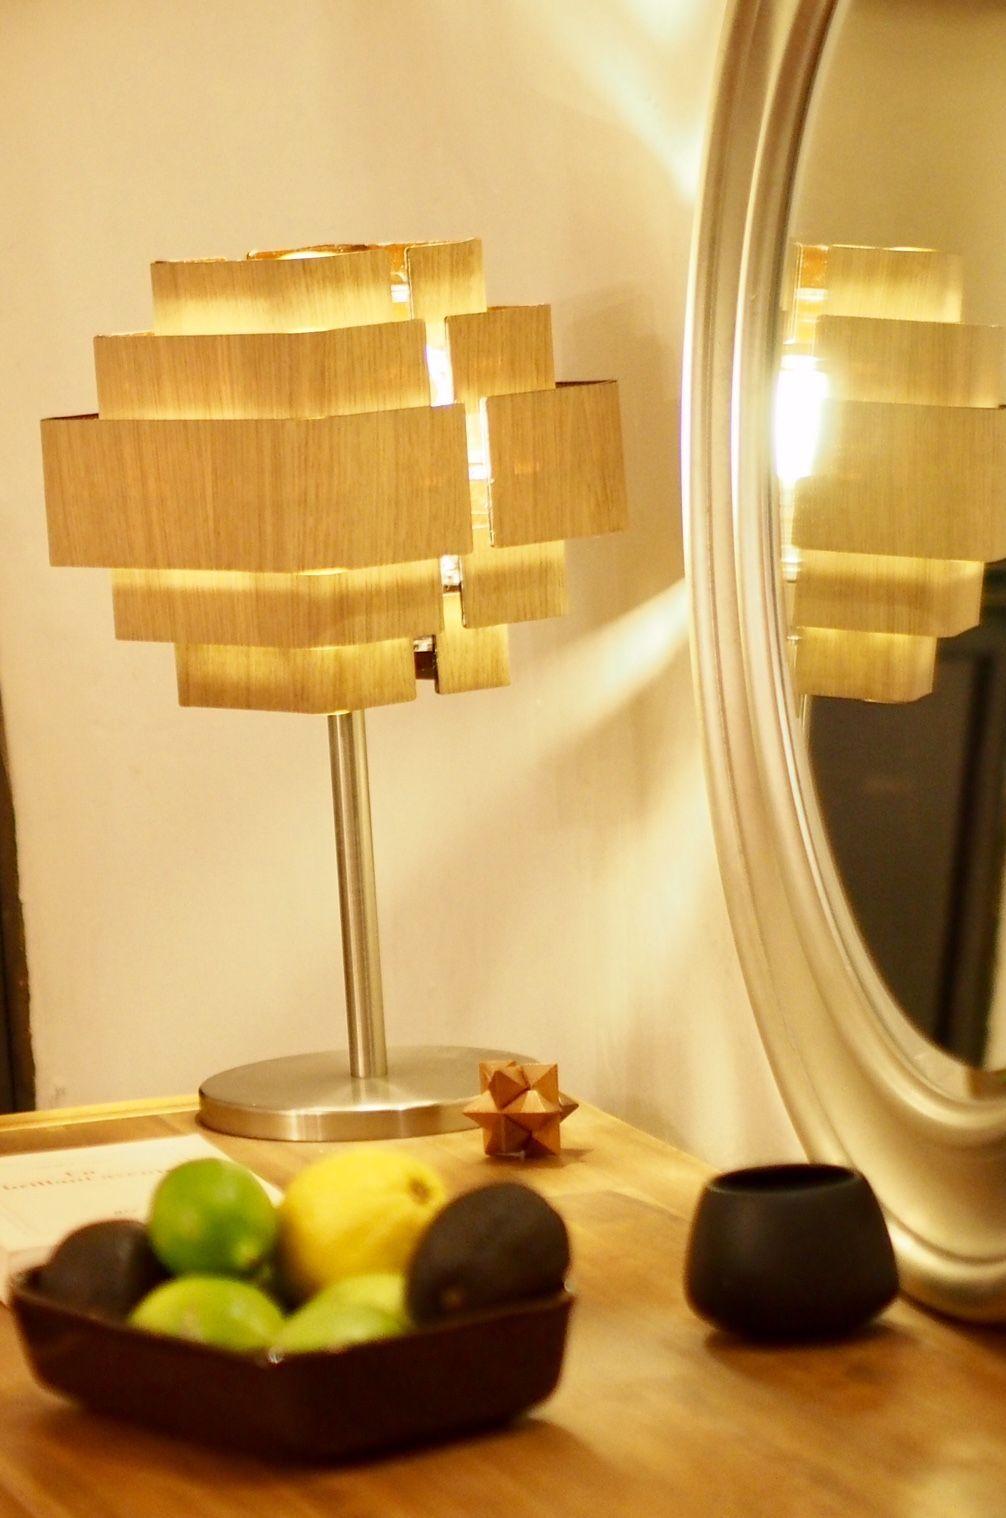 Lampe France Bois Acier Inspiration Déco Made Chêne Pied In Art Tl3KFJu1c